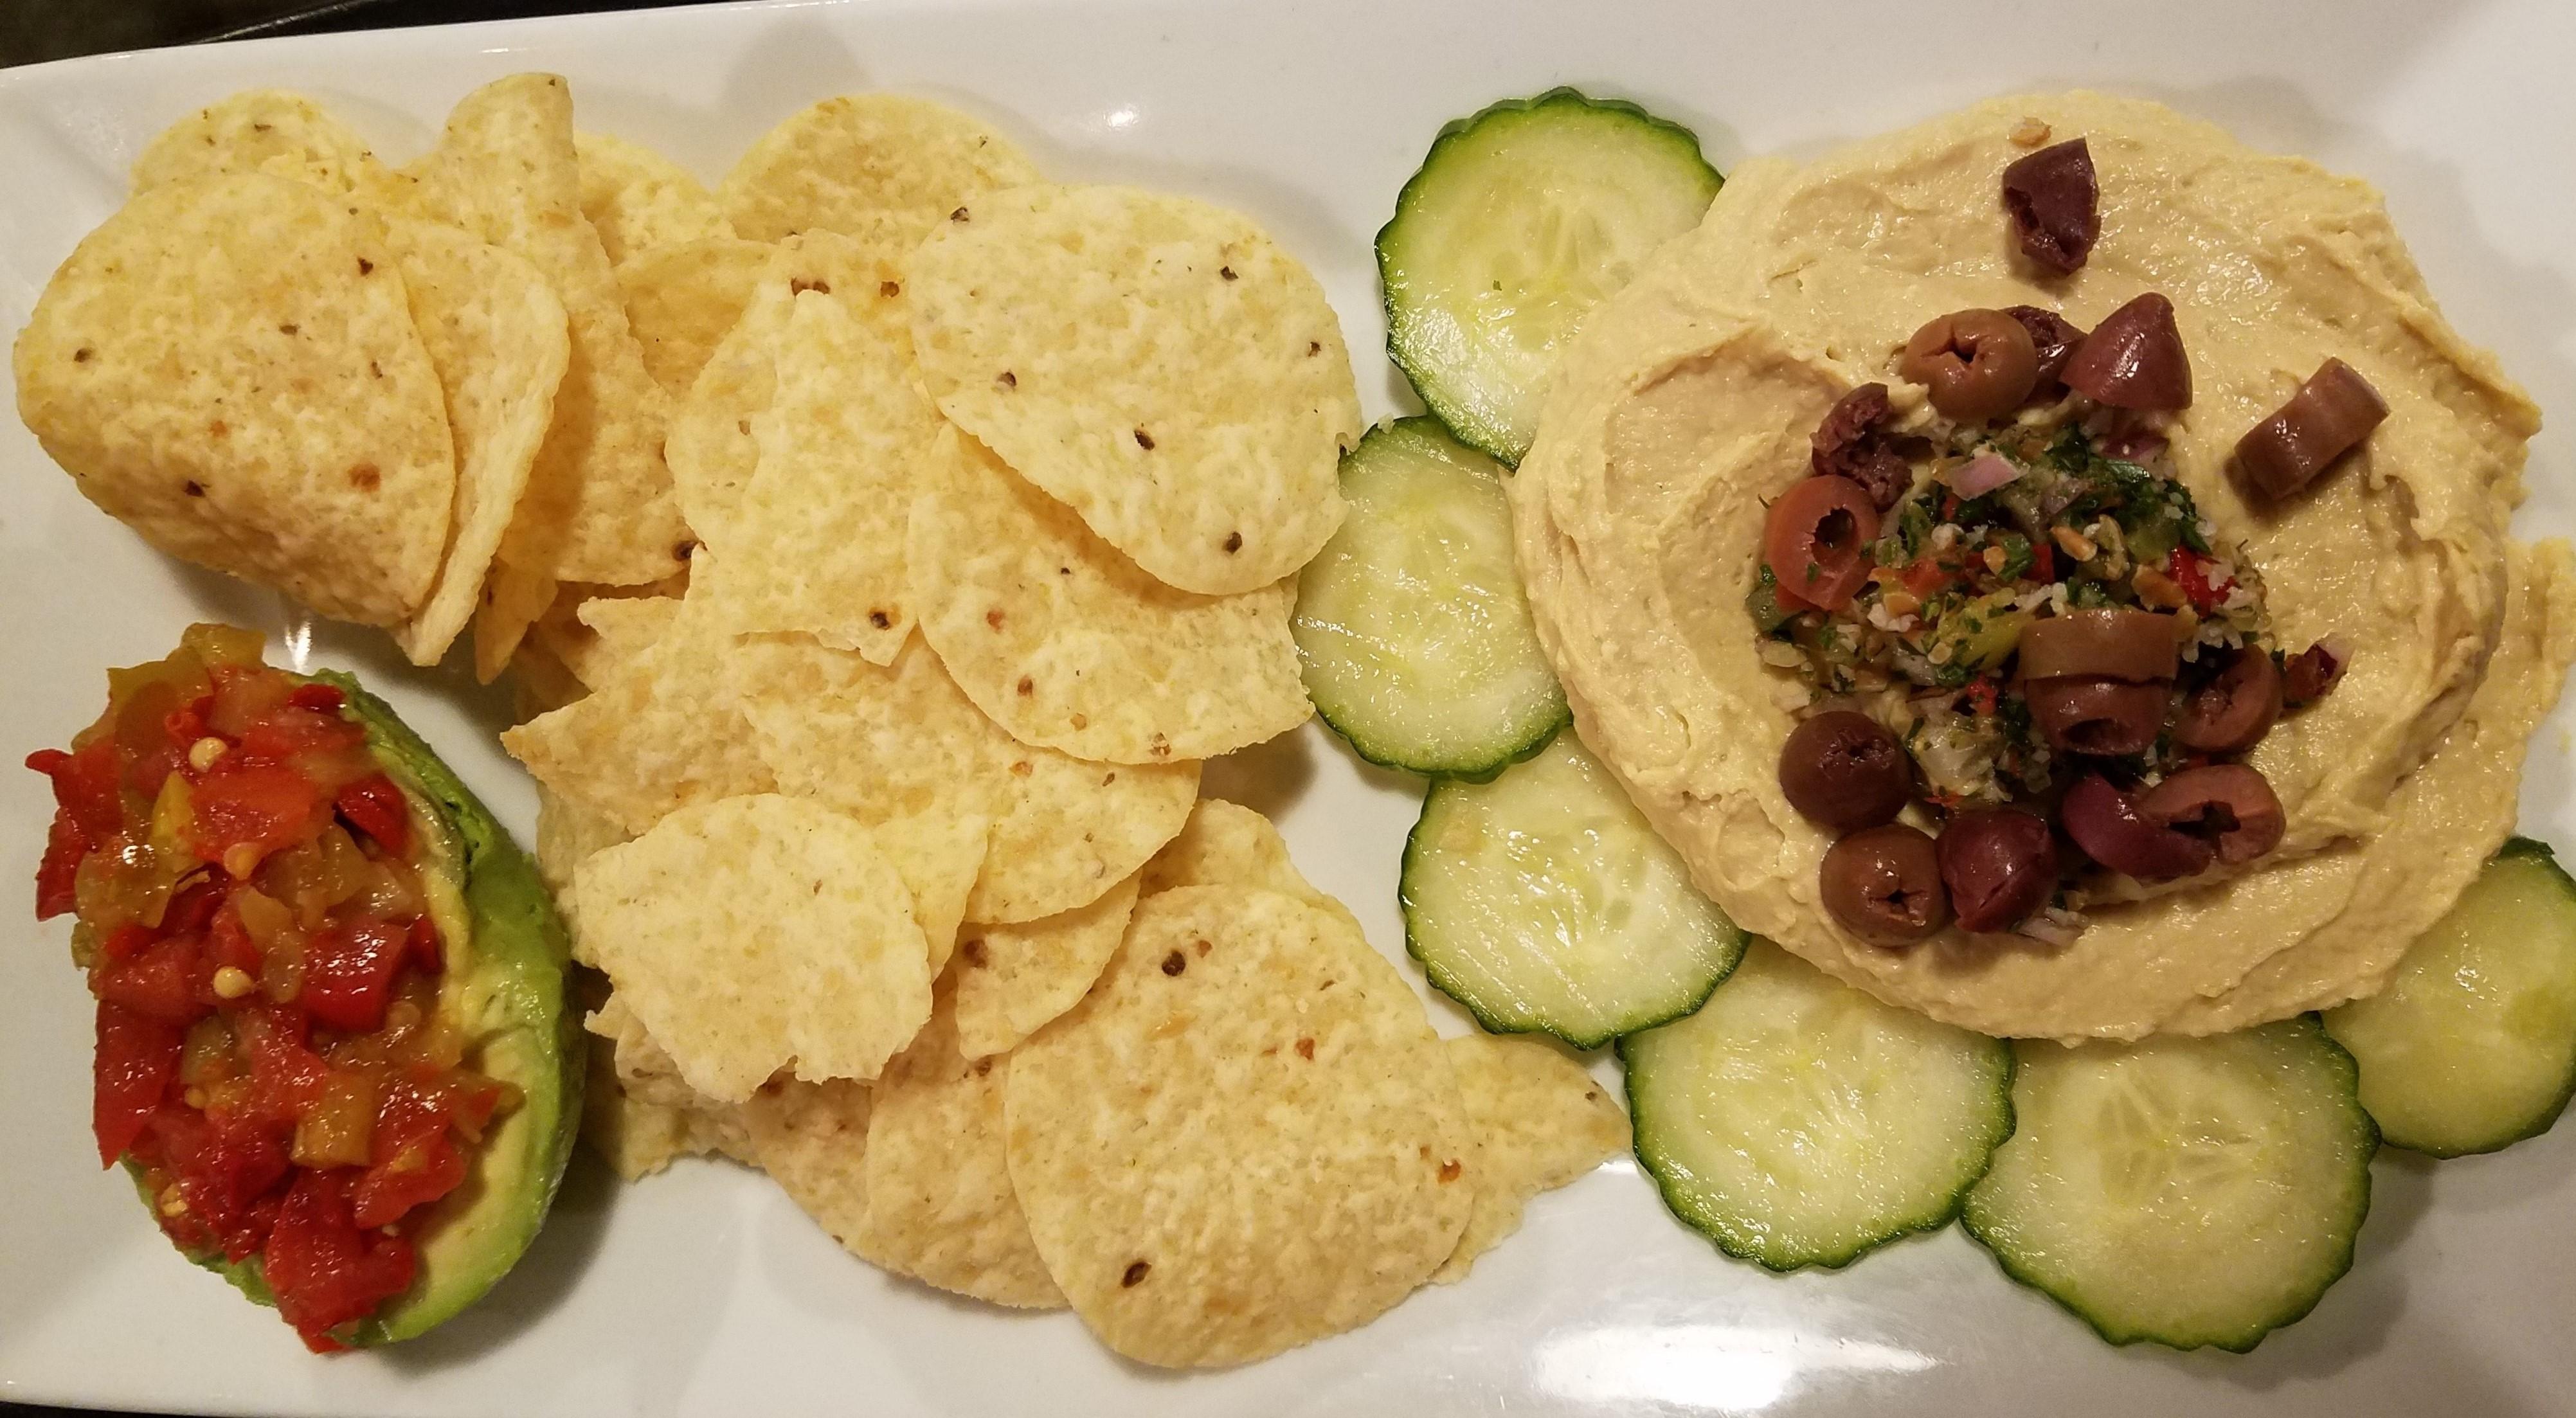 Stuffed Avocado & Hummus Platter Image